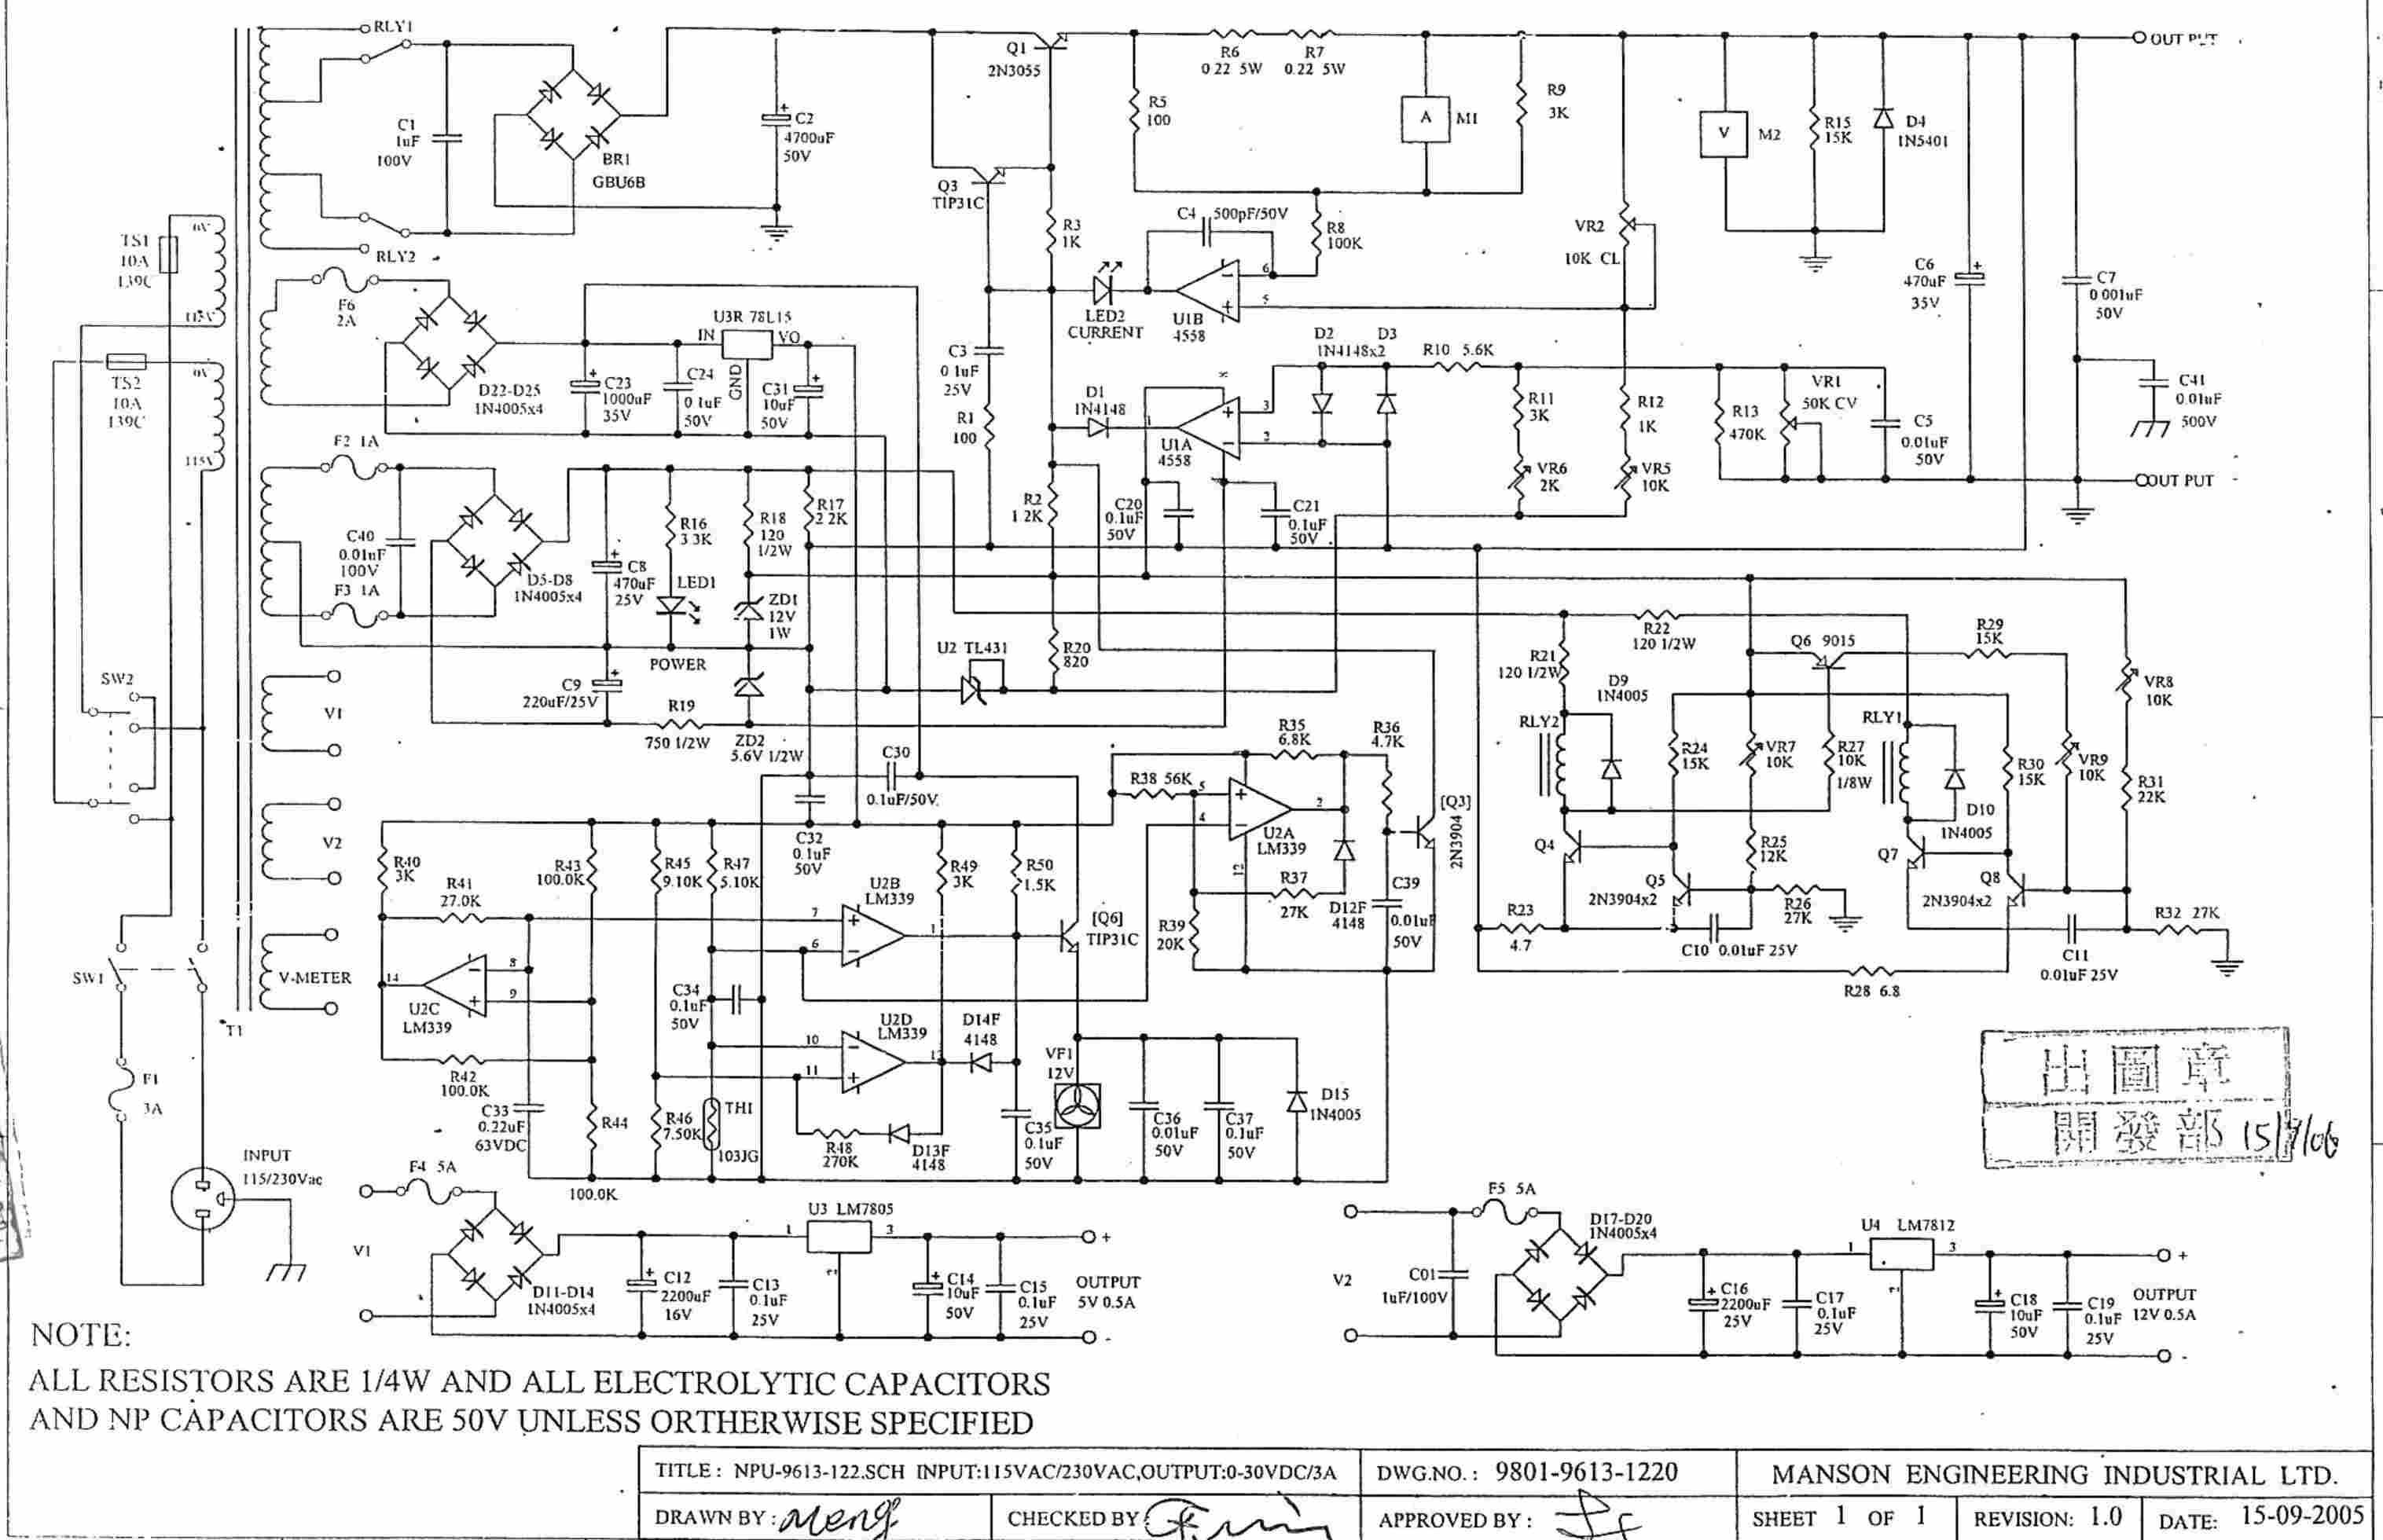 Lab Psu Based On A Single Power Amplifier